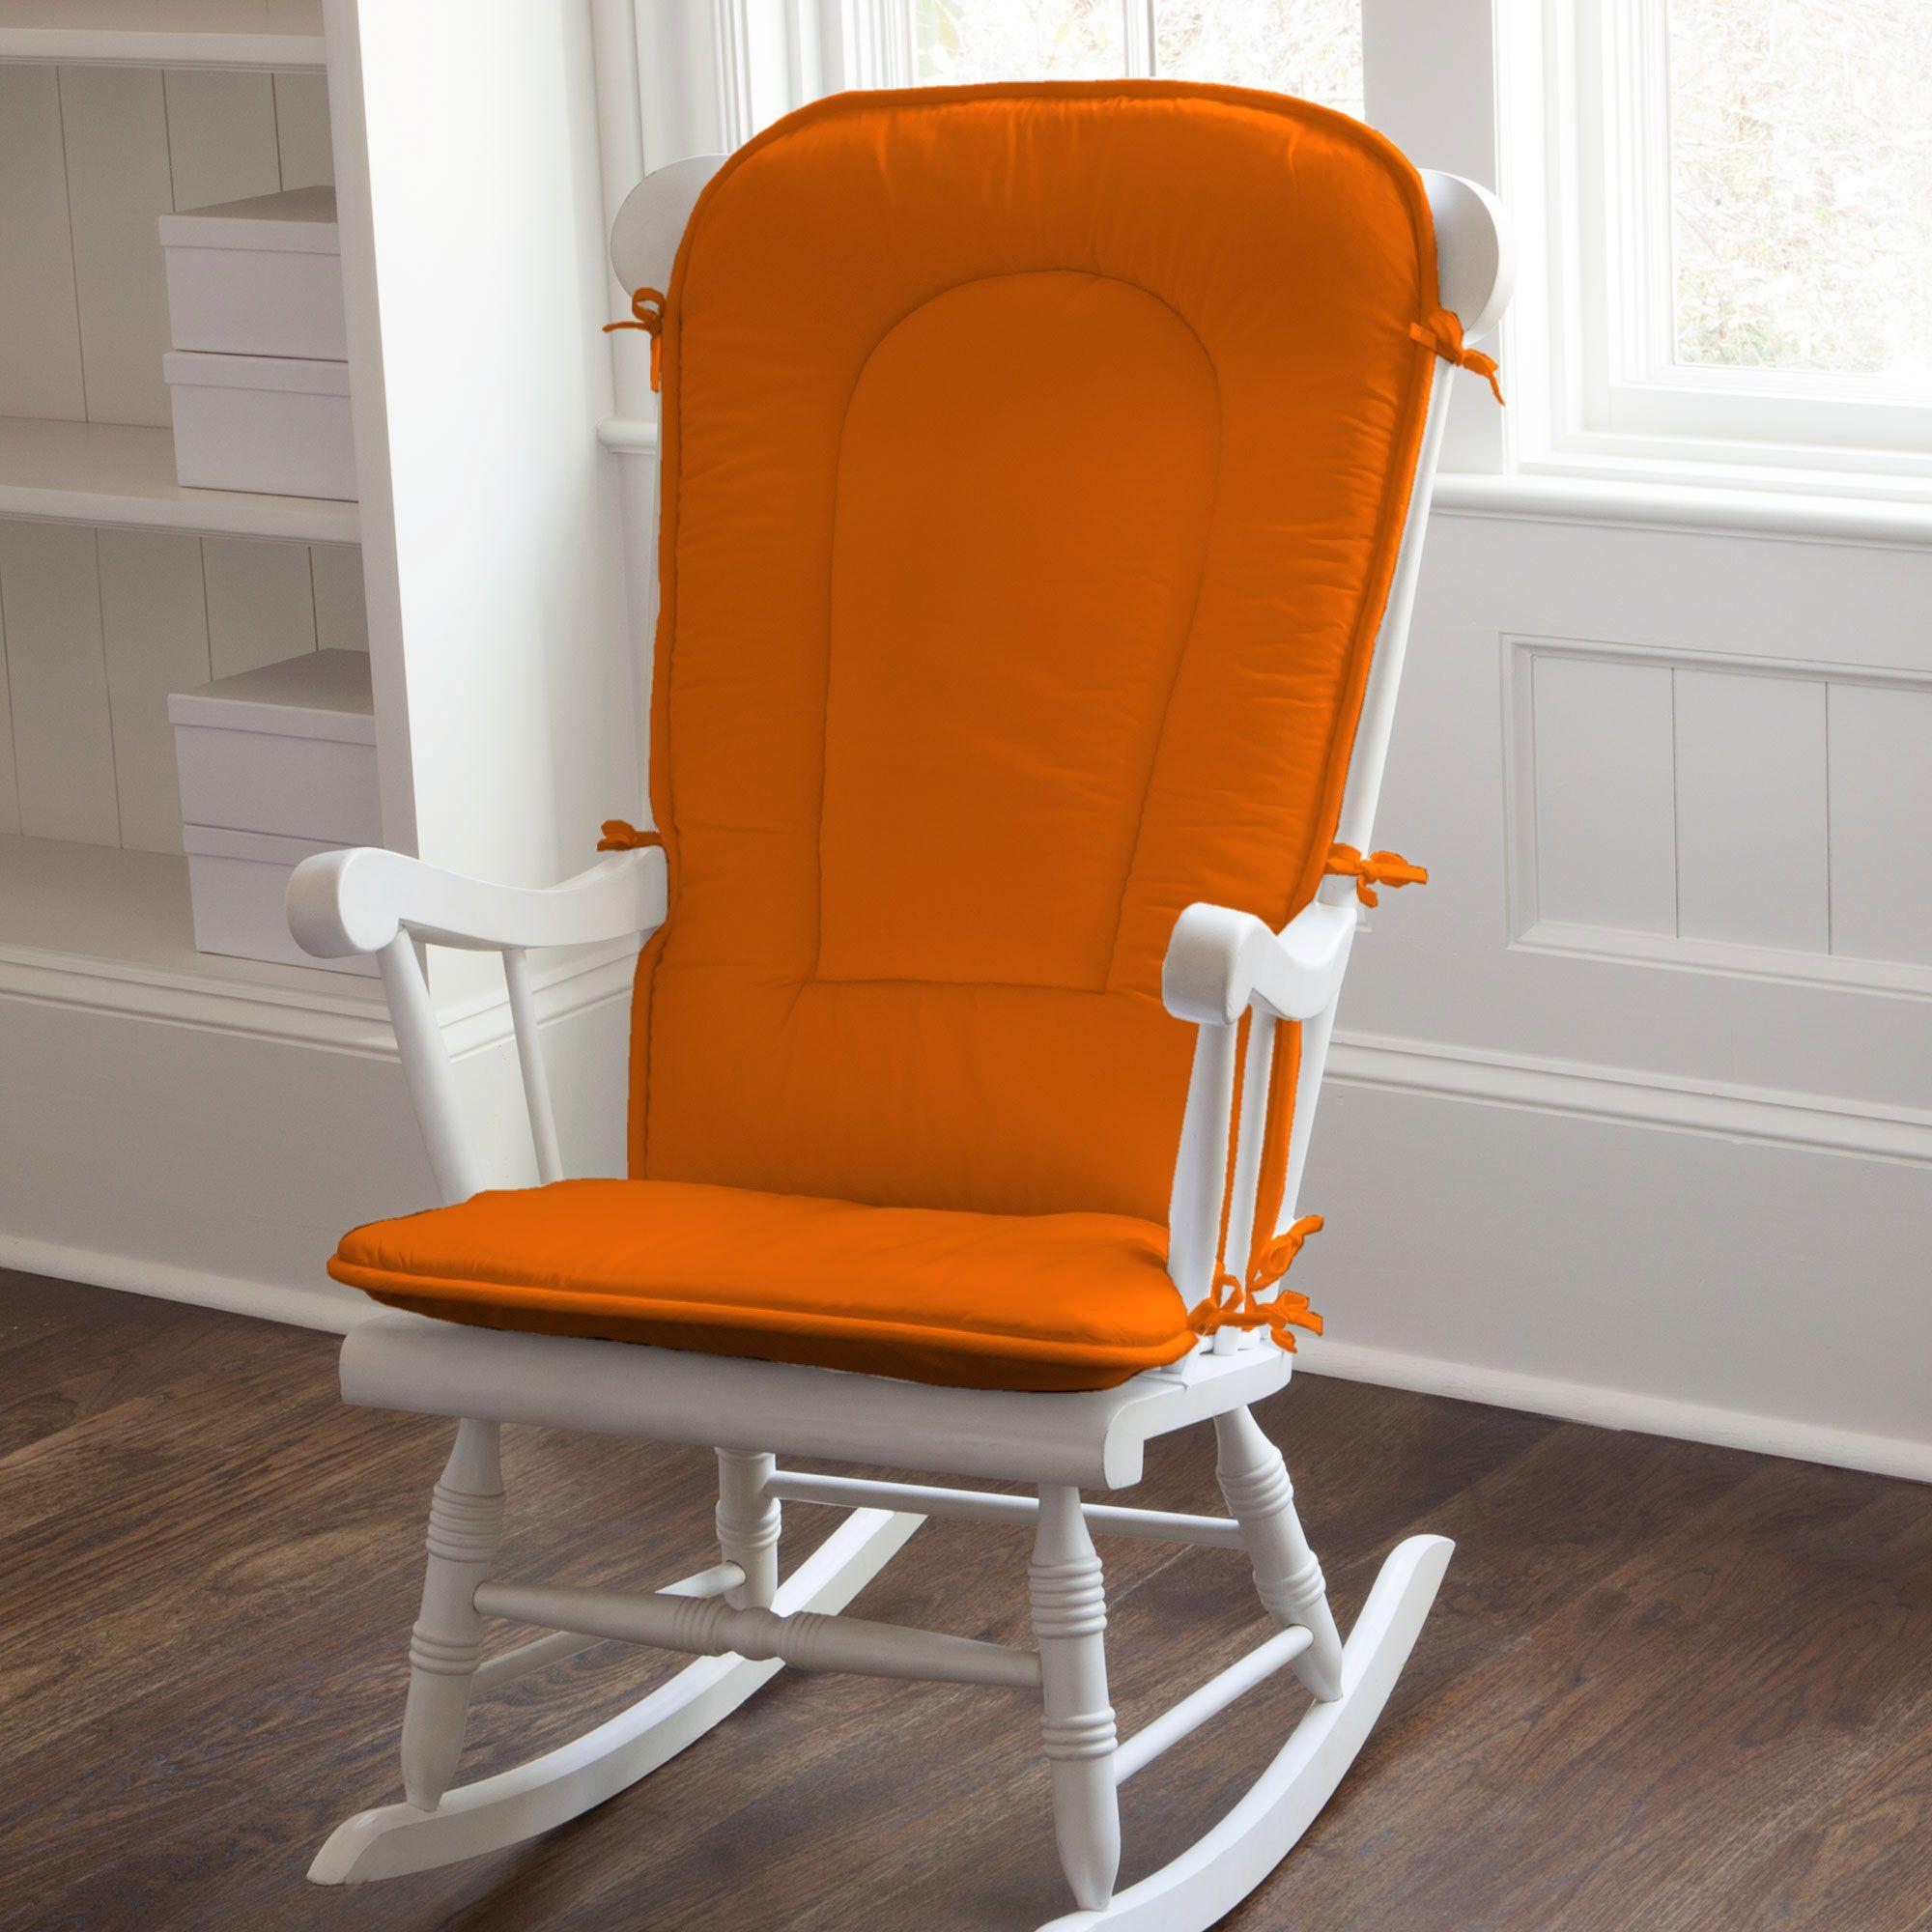 High Quality Solid Orange Rocking Chair Pad